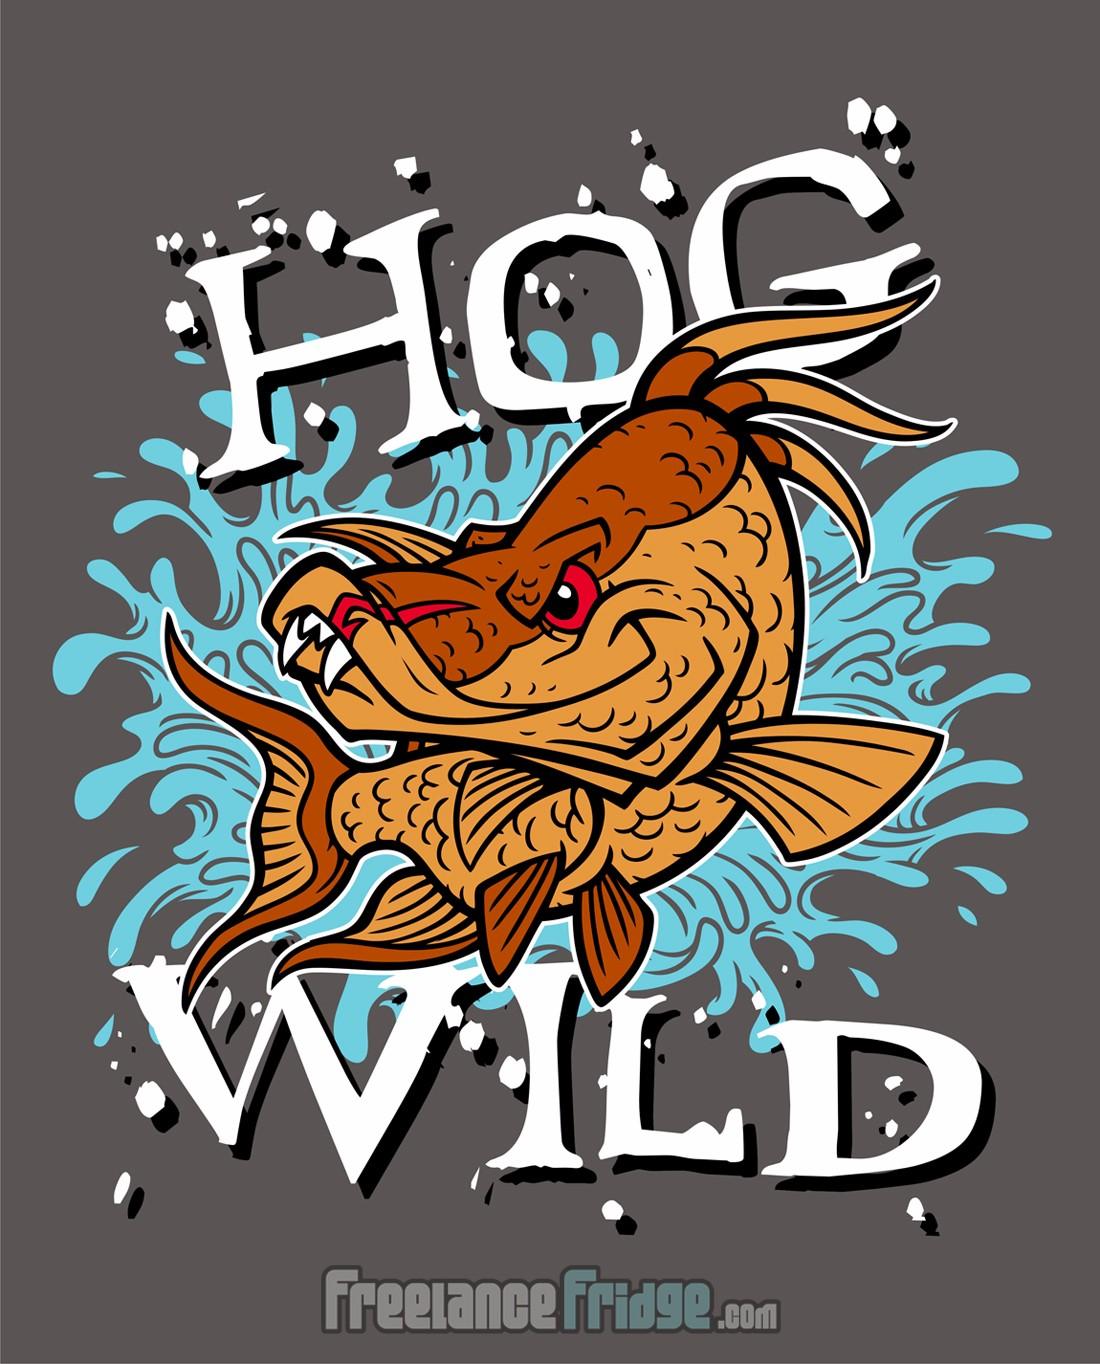 Hog Wild Hogfish Fishing T-shirt Design Illustration